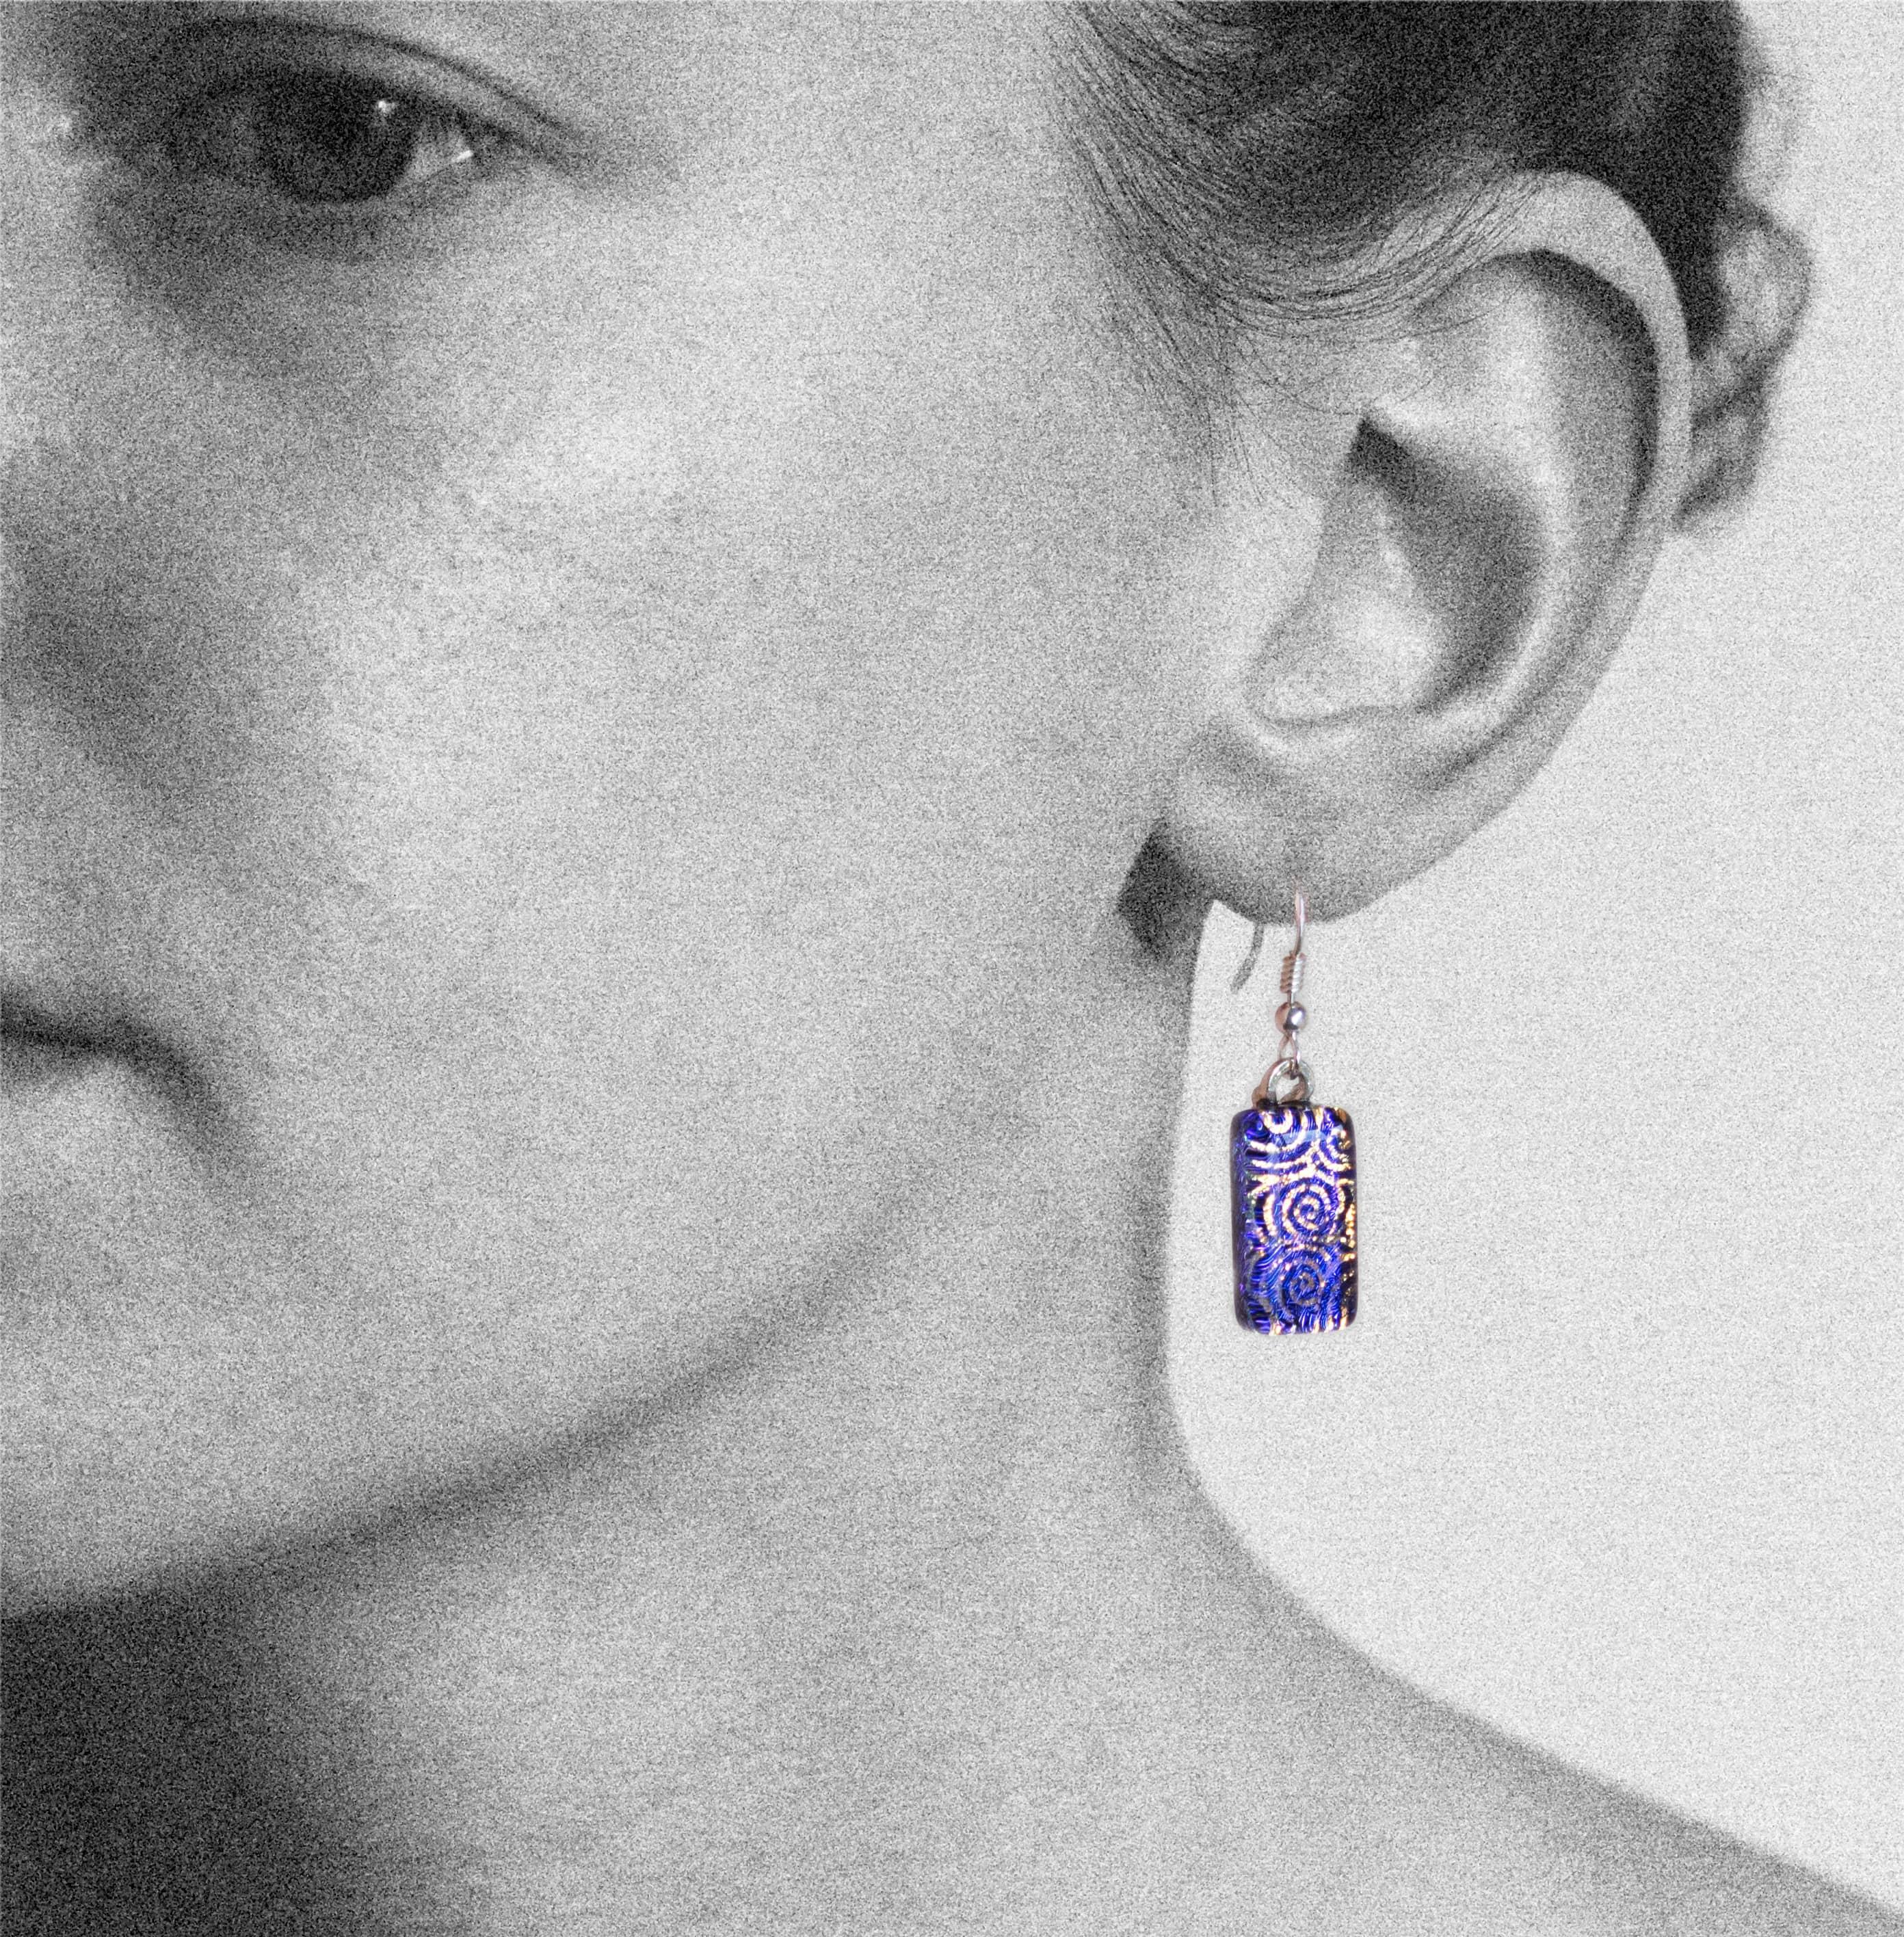 Dichroic glass jewellery drop earrings,purple with gold pattern glass drop earrings, art glass earrings handmade in Shropshire, sterling silver hooks